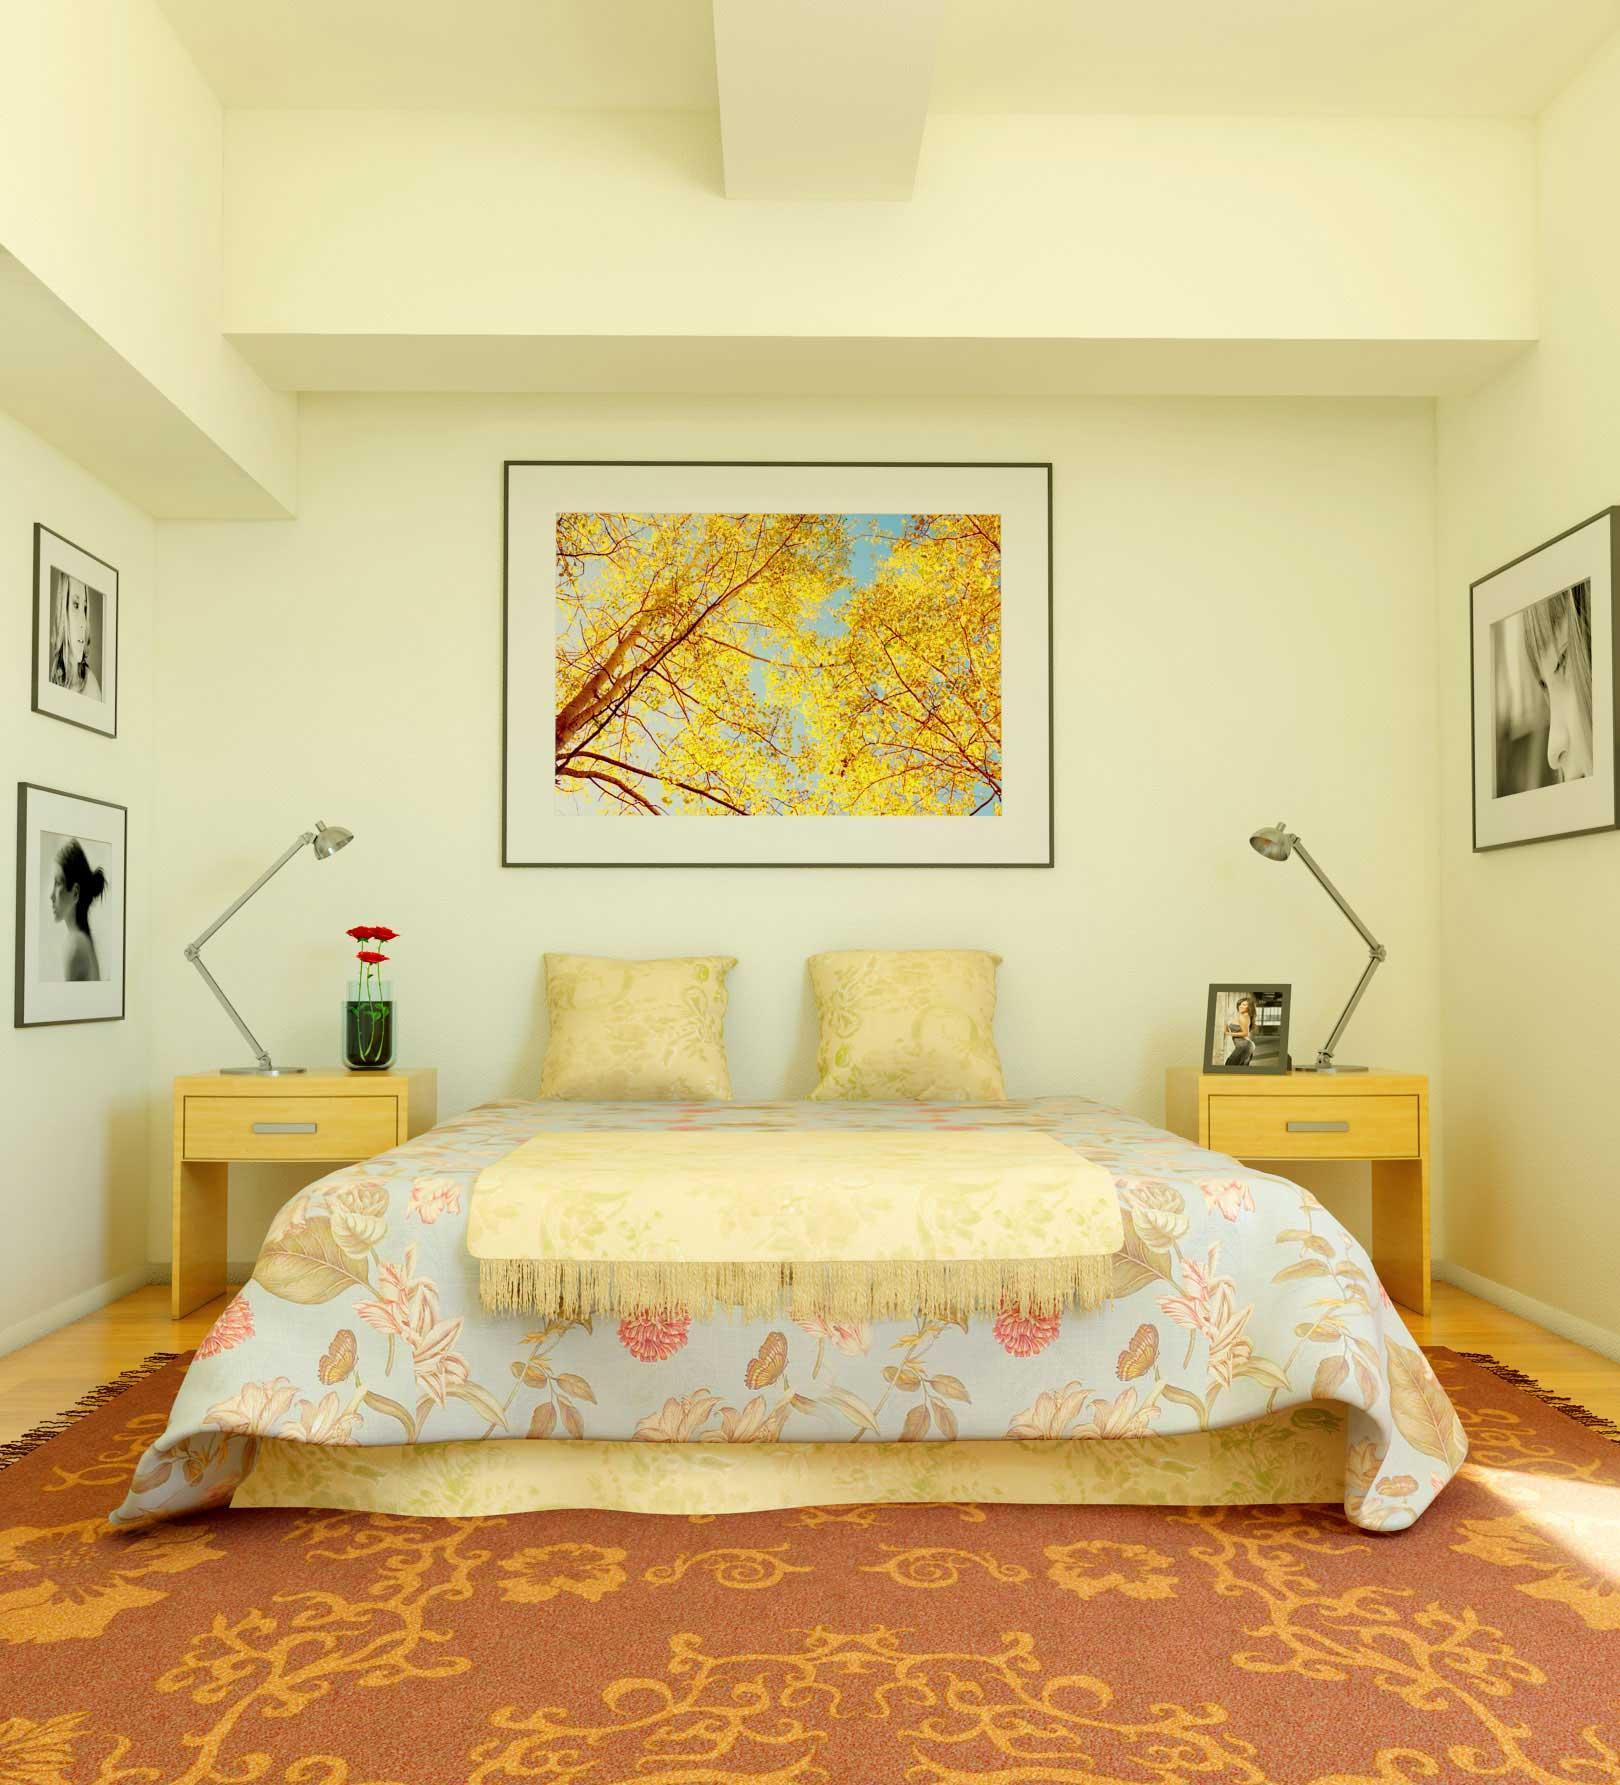 Желтые интерьерные акценты в спальне